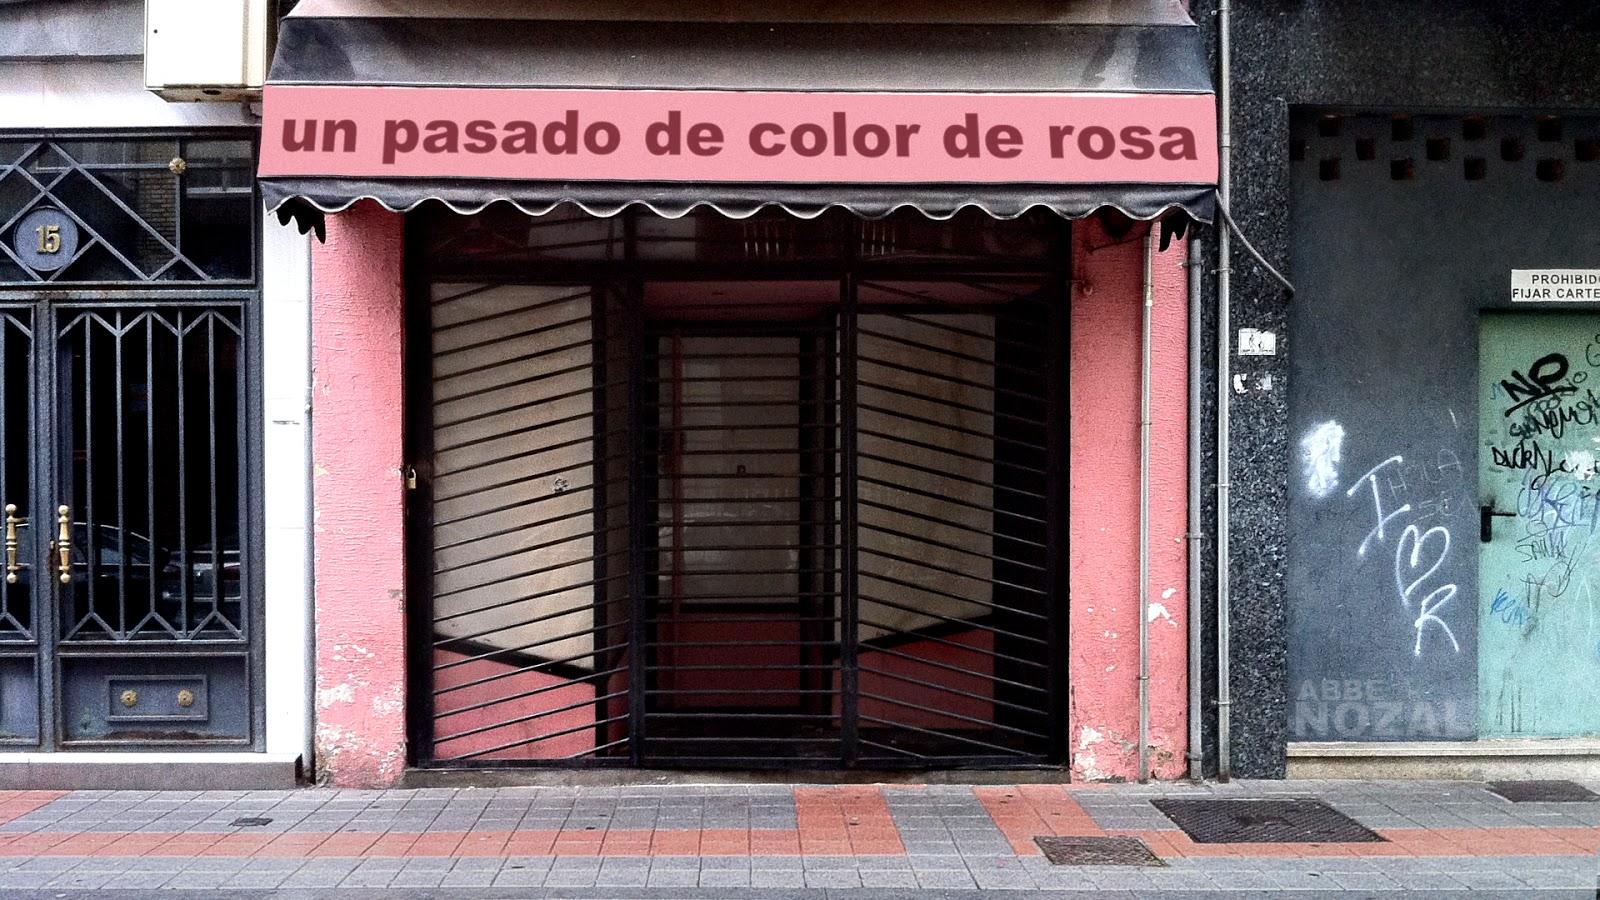 Un pasado de color de rosa, 2014 Abbé Nozal